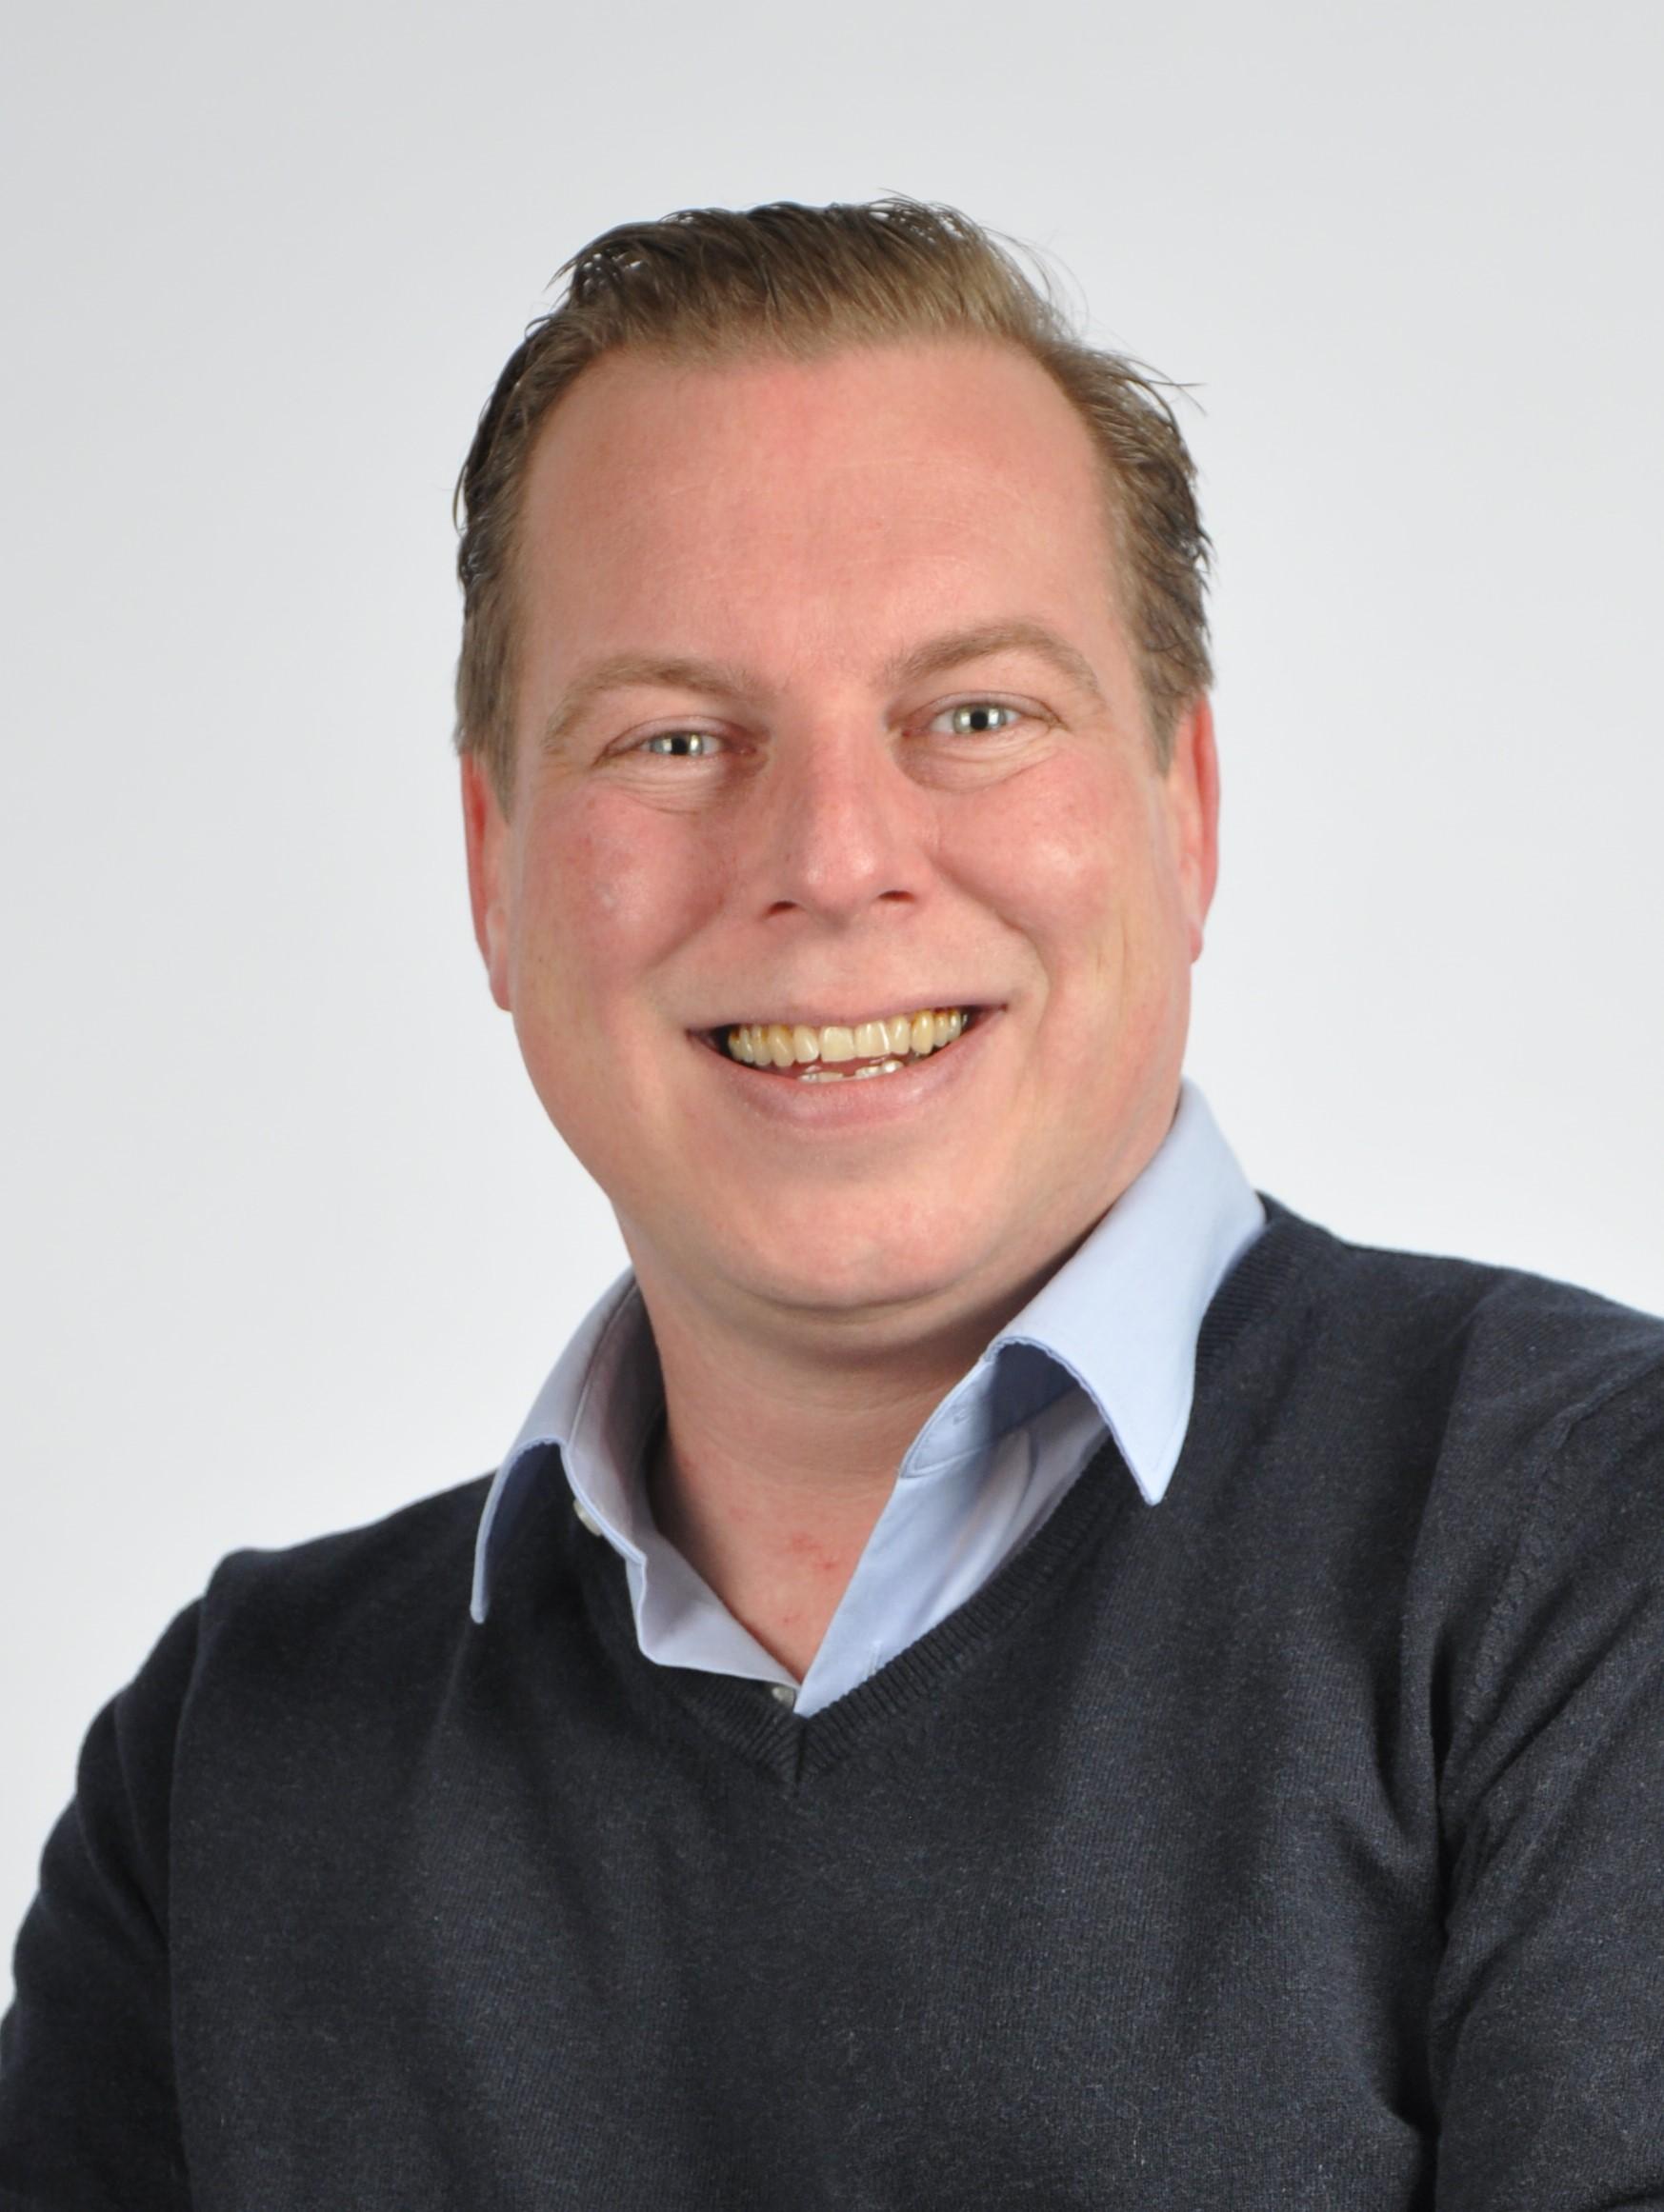 Niels Stuijfzand